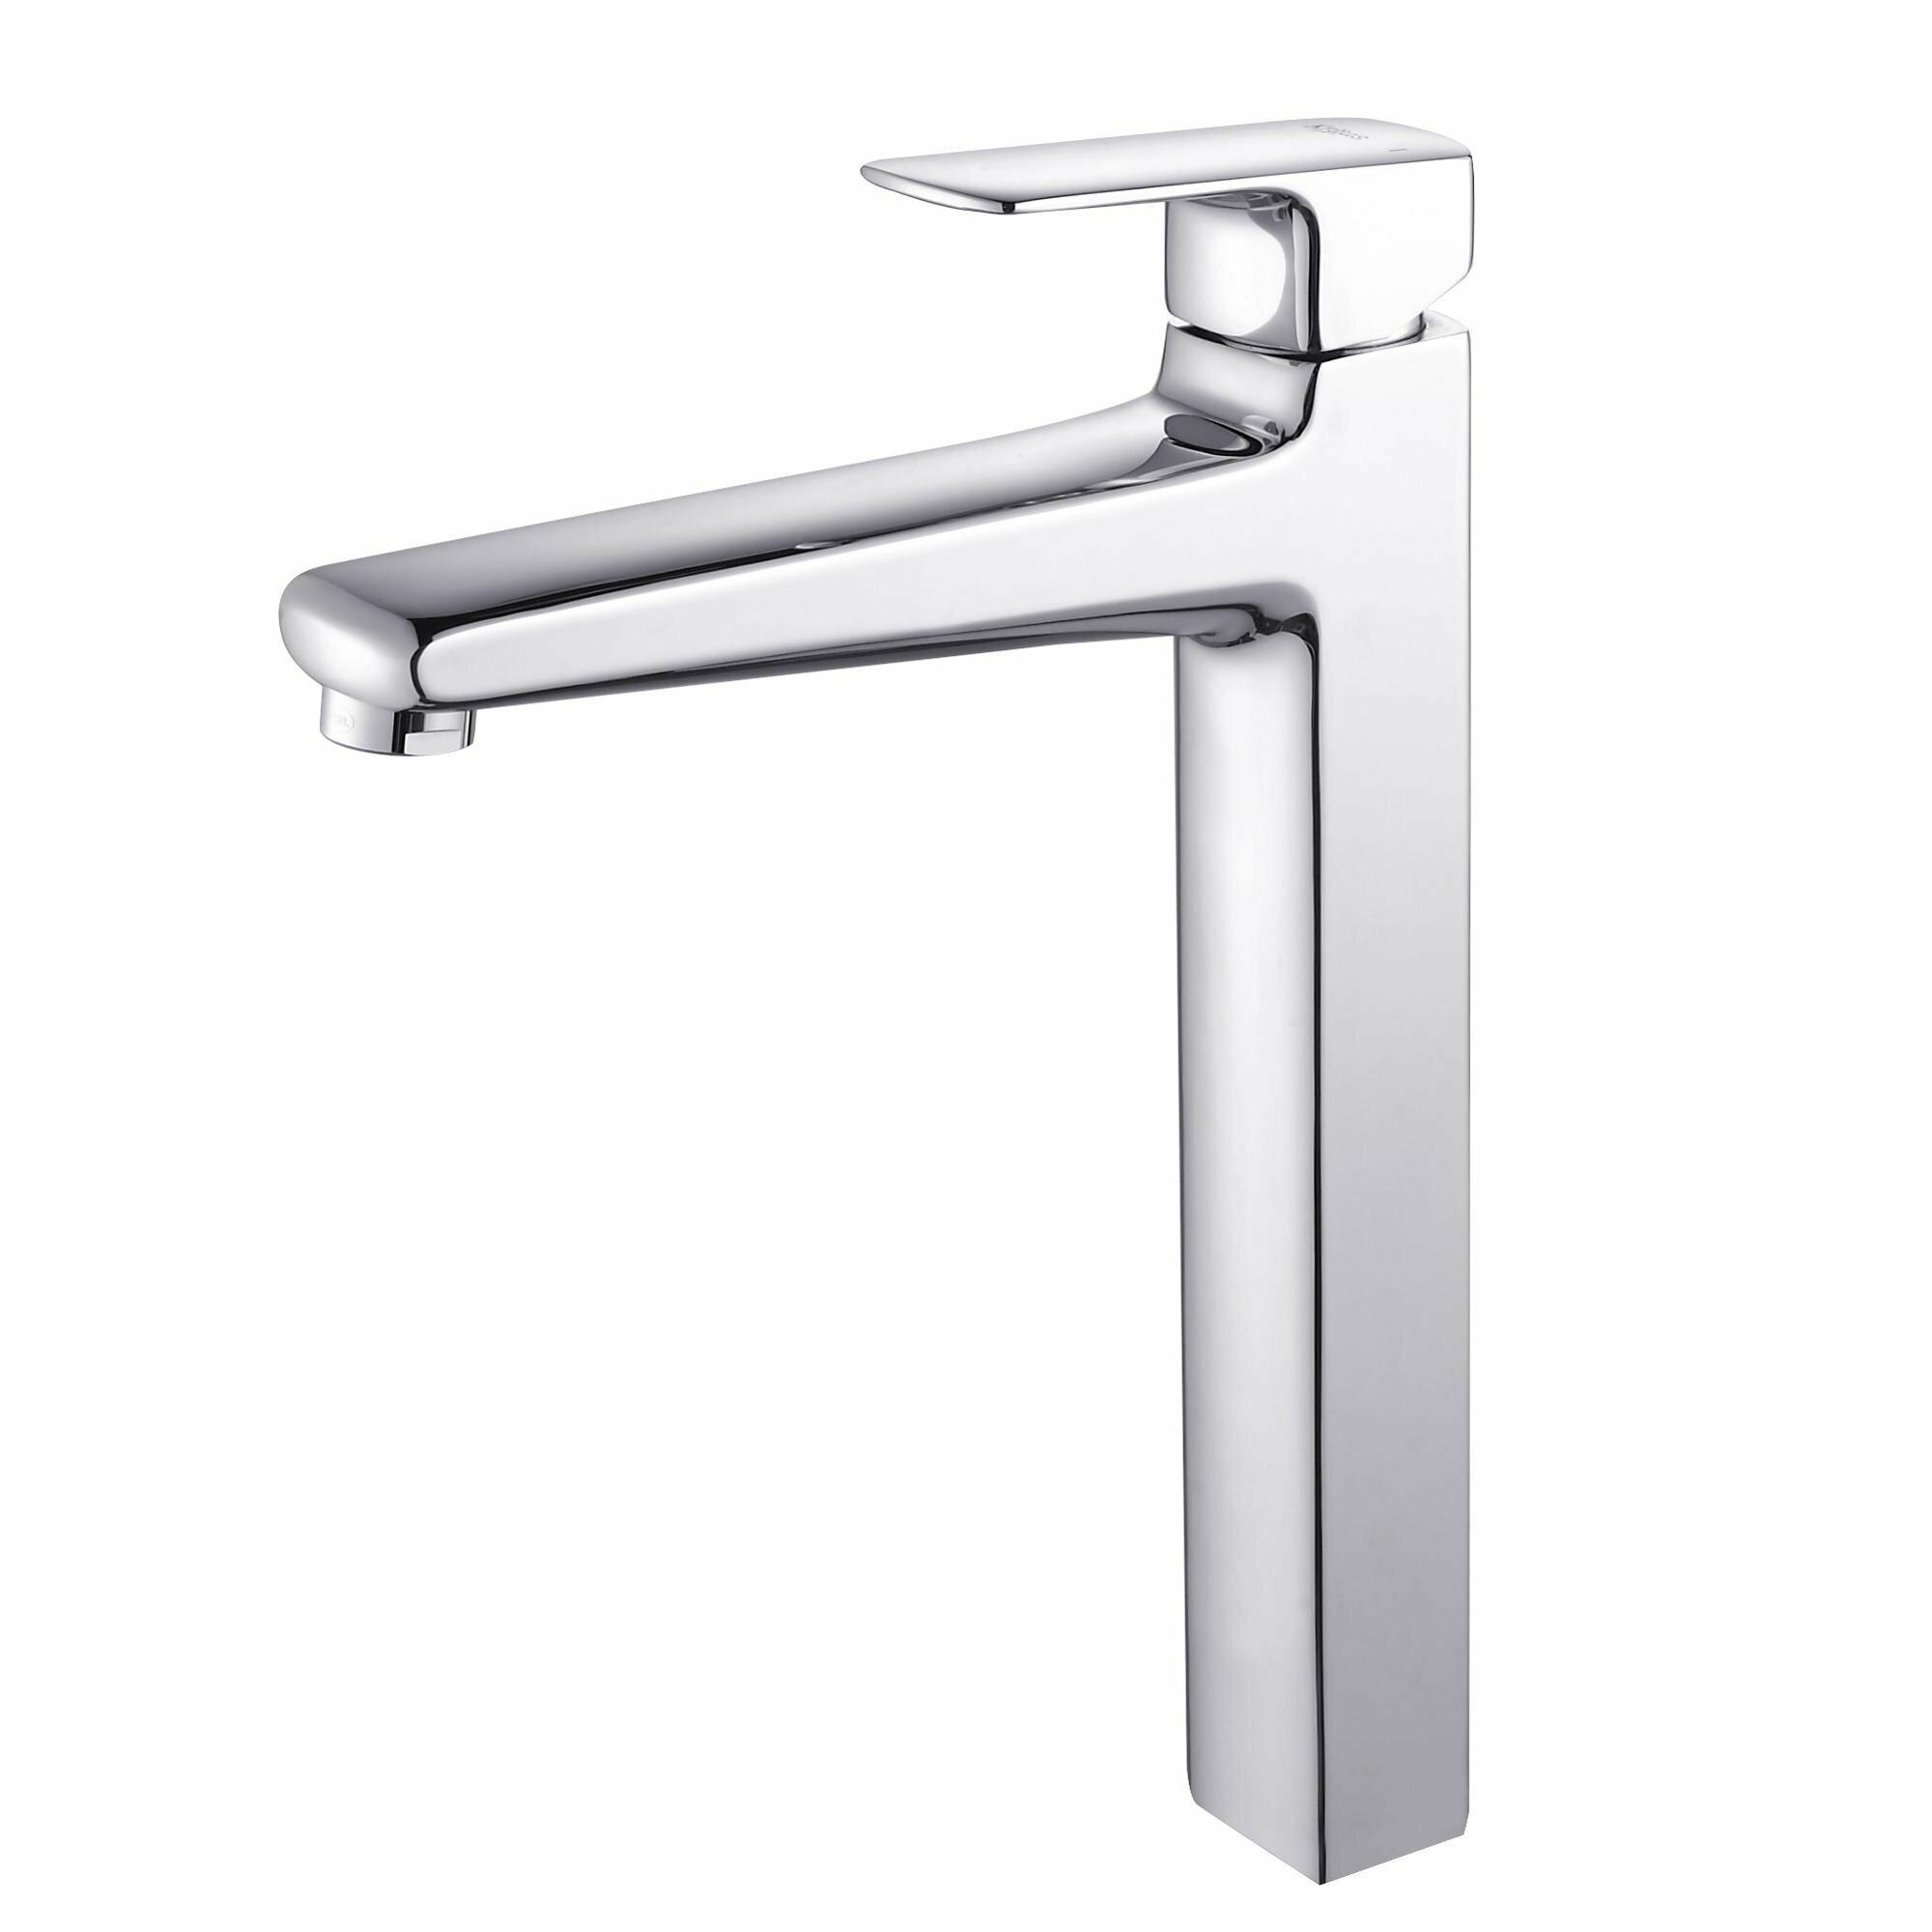 Kraus virtus square ceramic bathroom sink with faucet - Kraus shower faucets ...